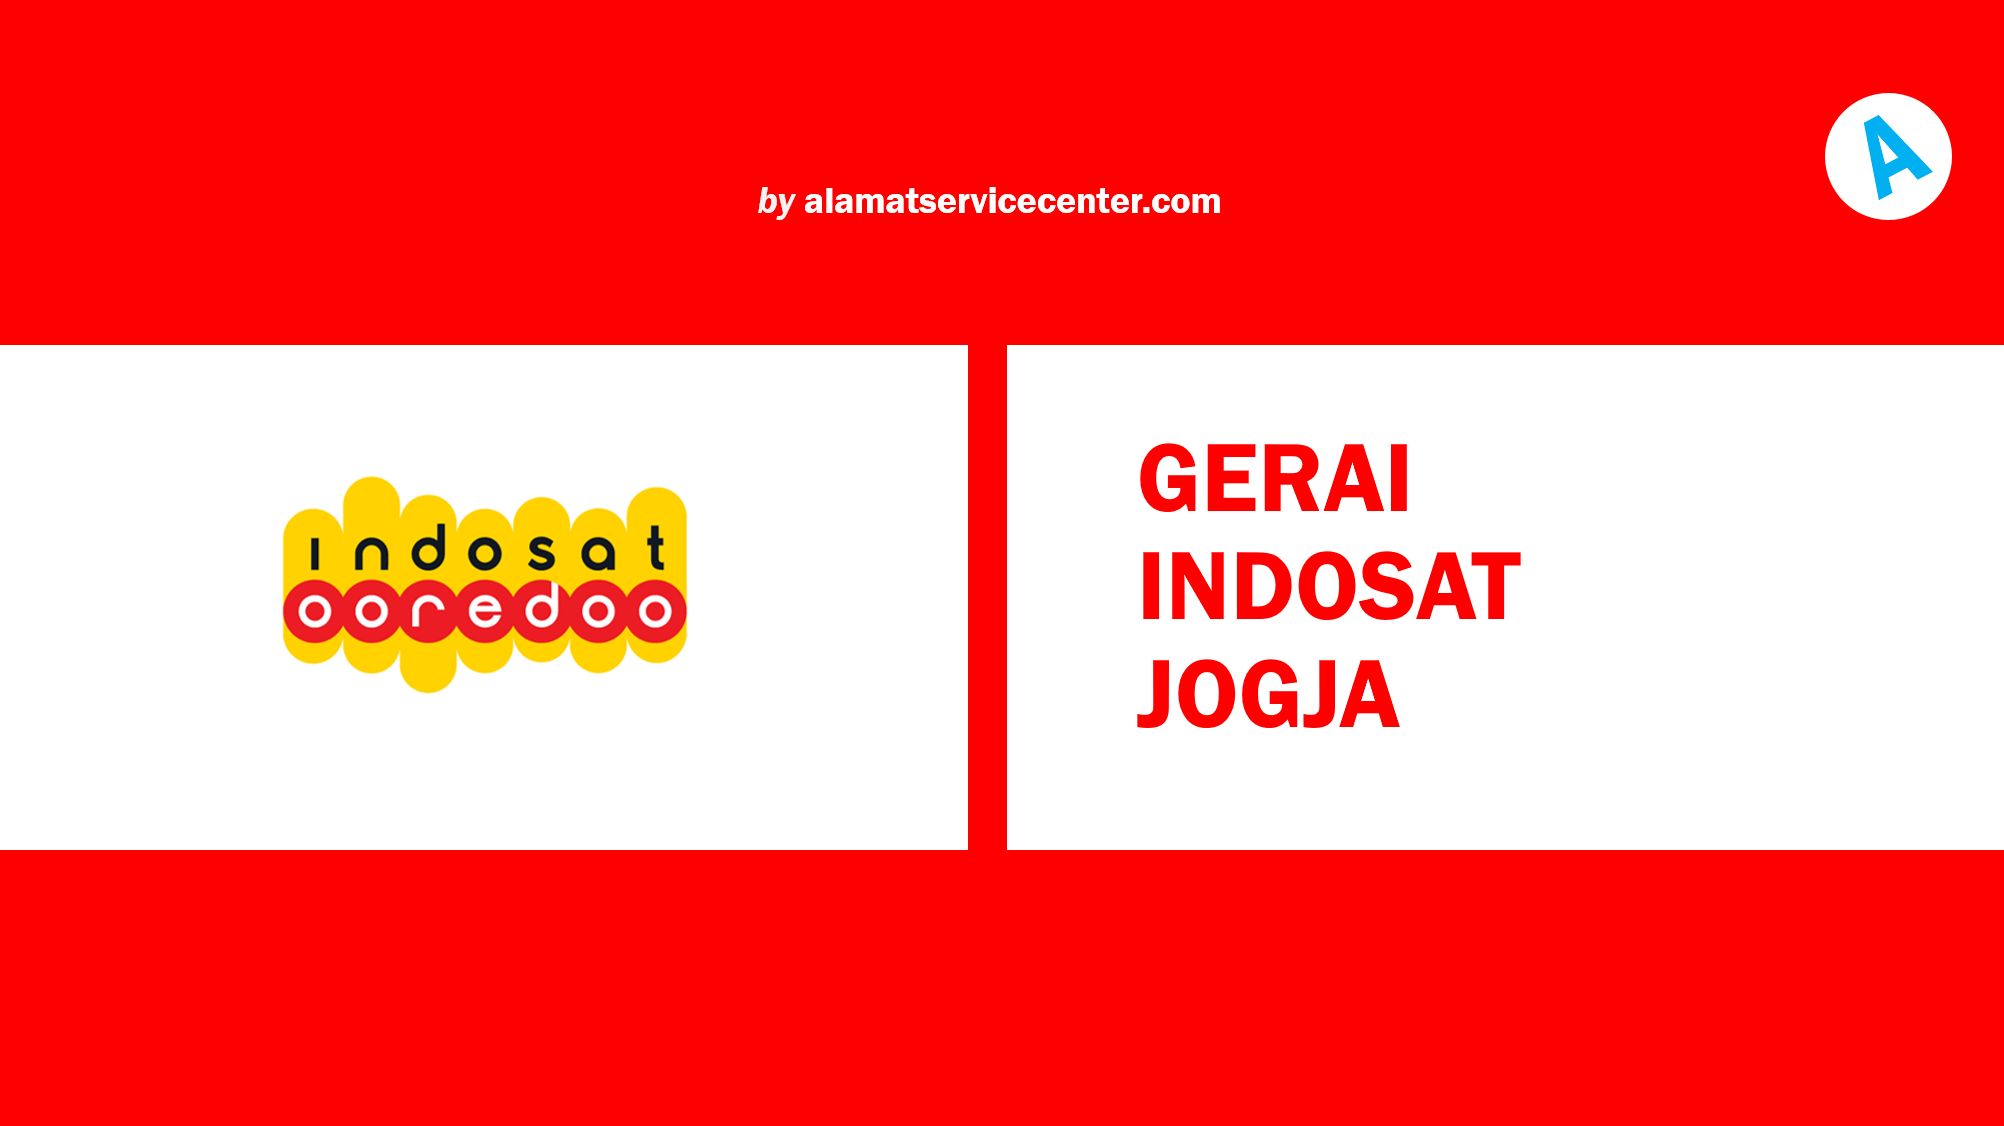 Gerai Indosat Jogja